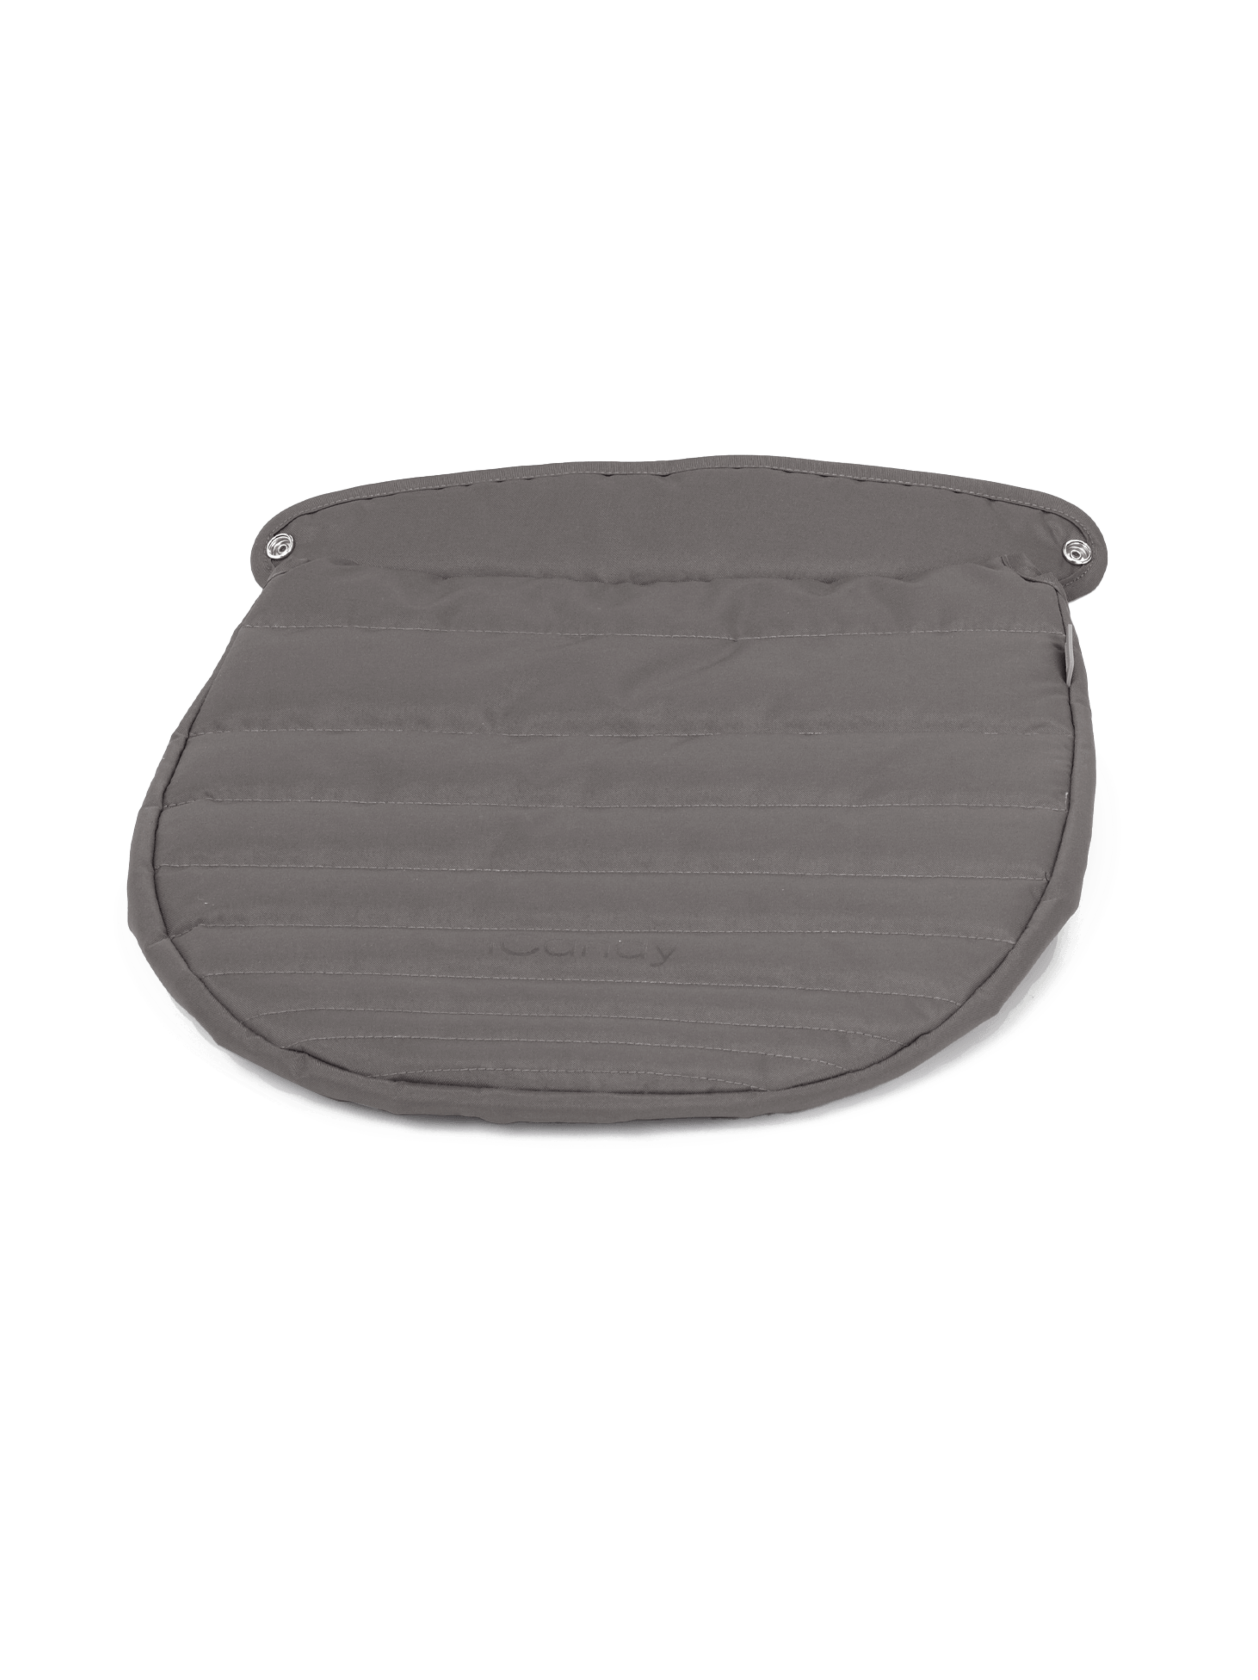 Raspberry Carrycot Apron - Granite